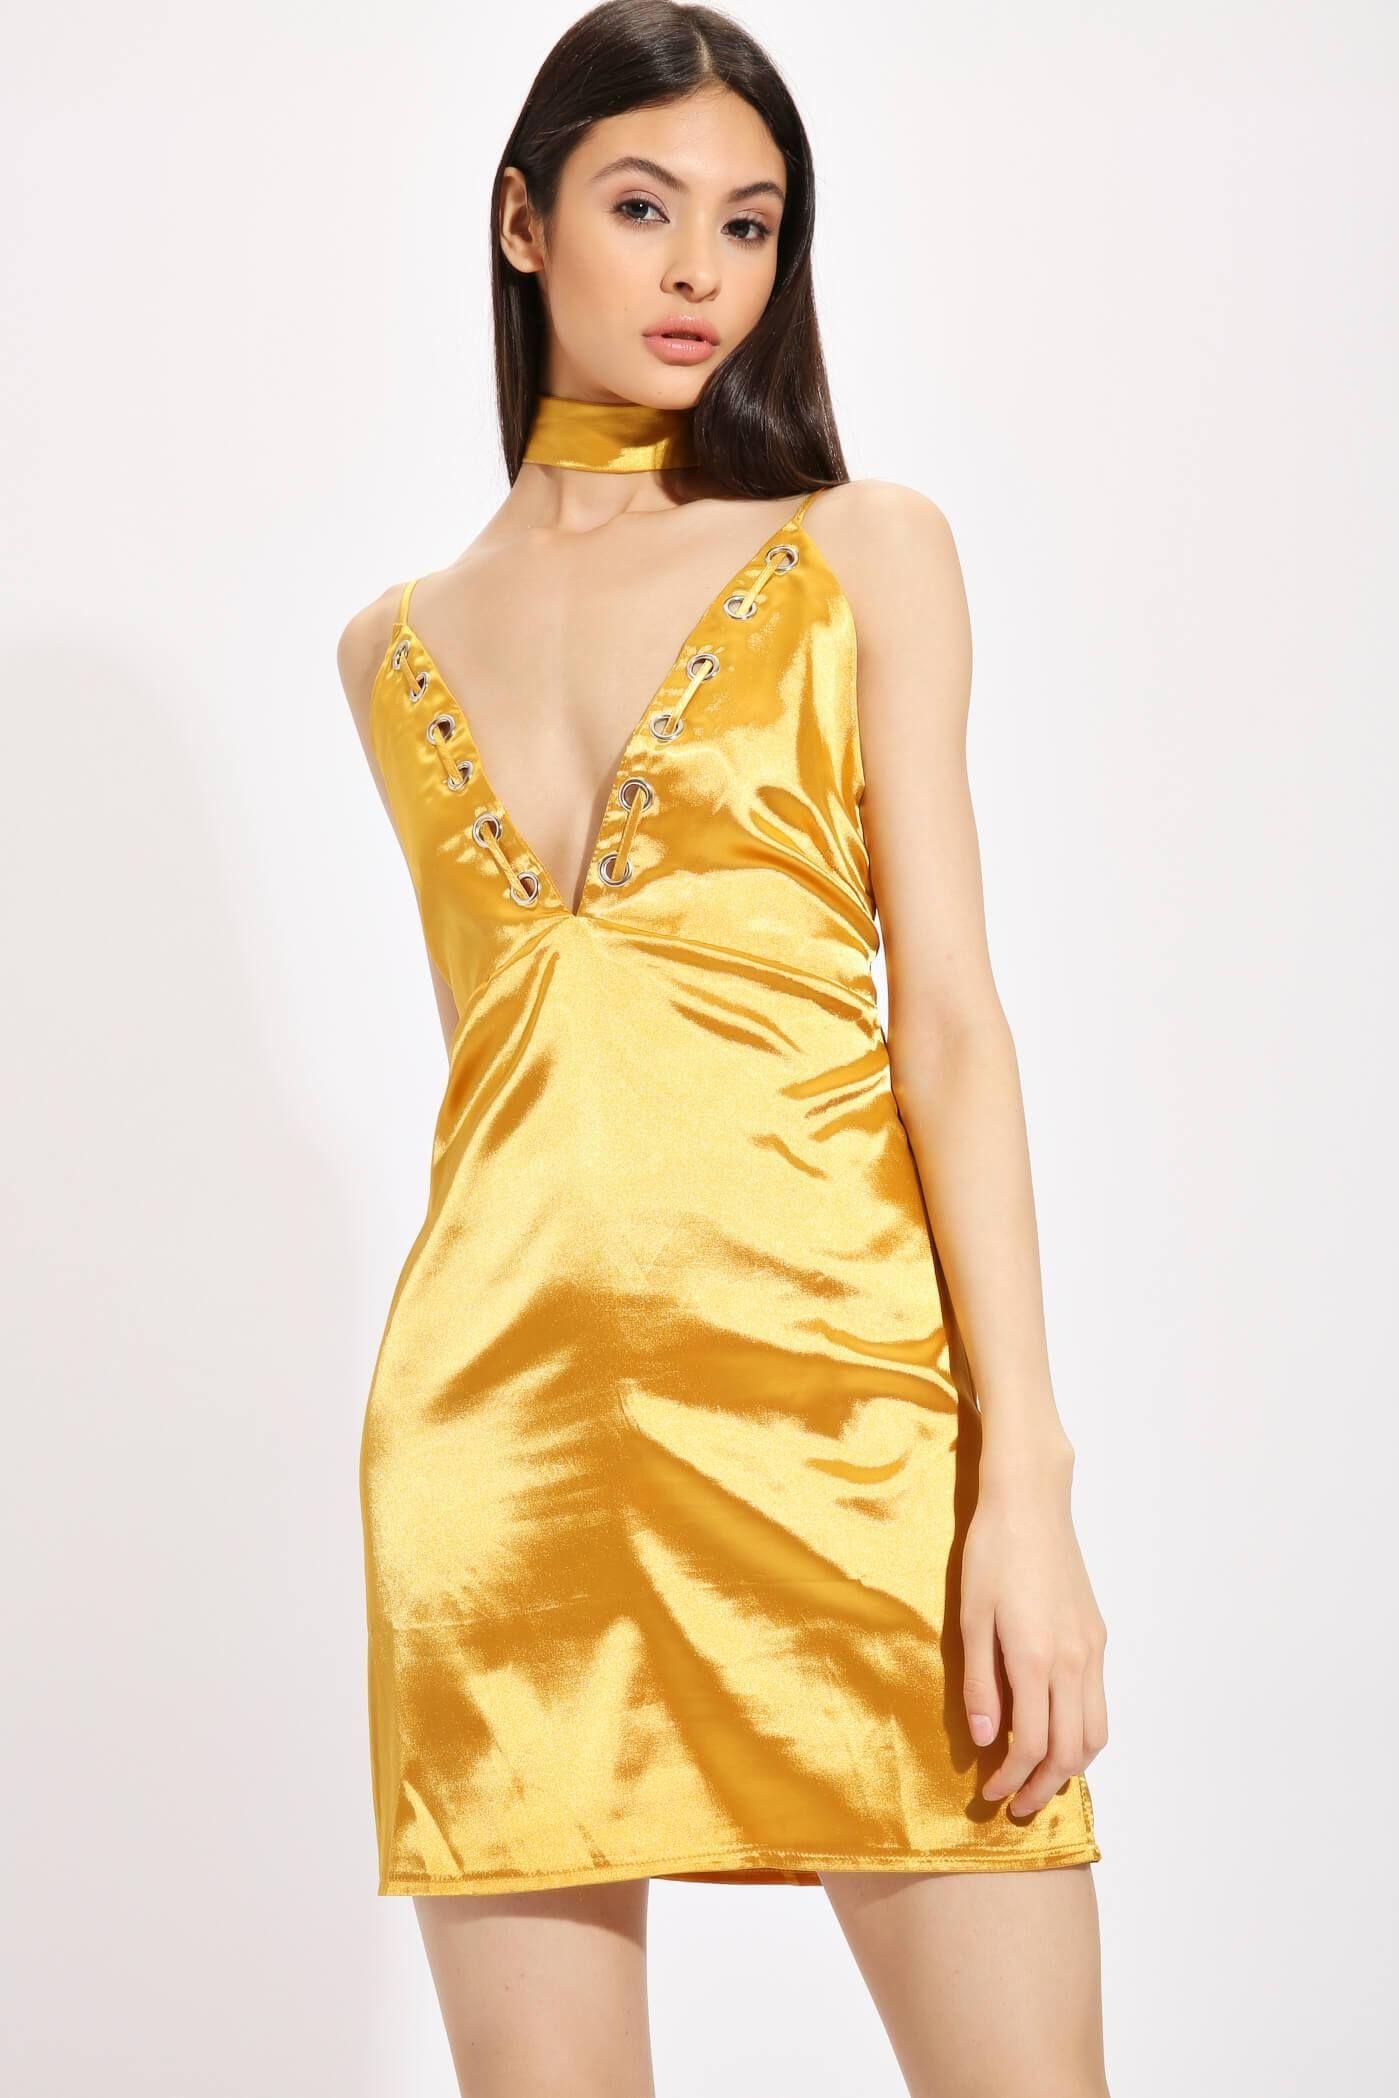 587246ab39 Gold Satin Eyelet Shift Dress